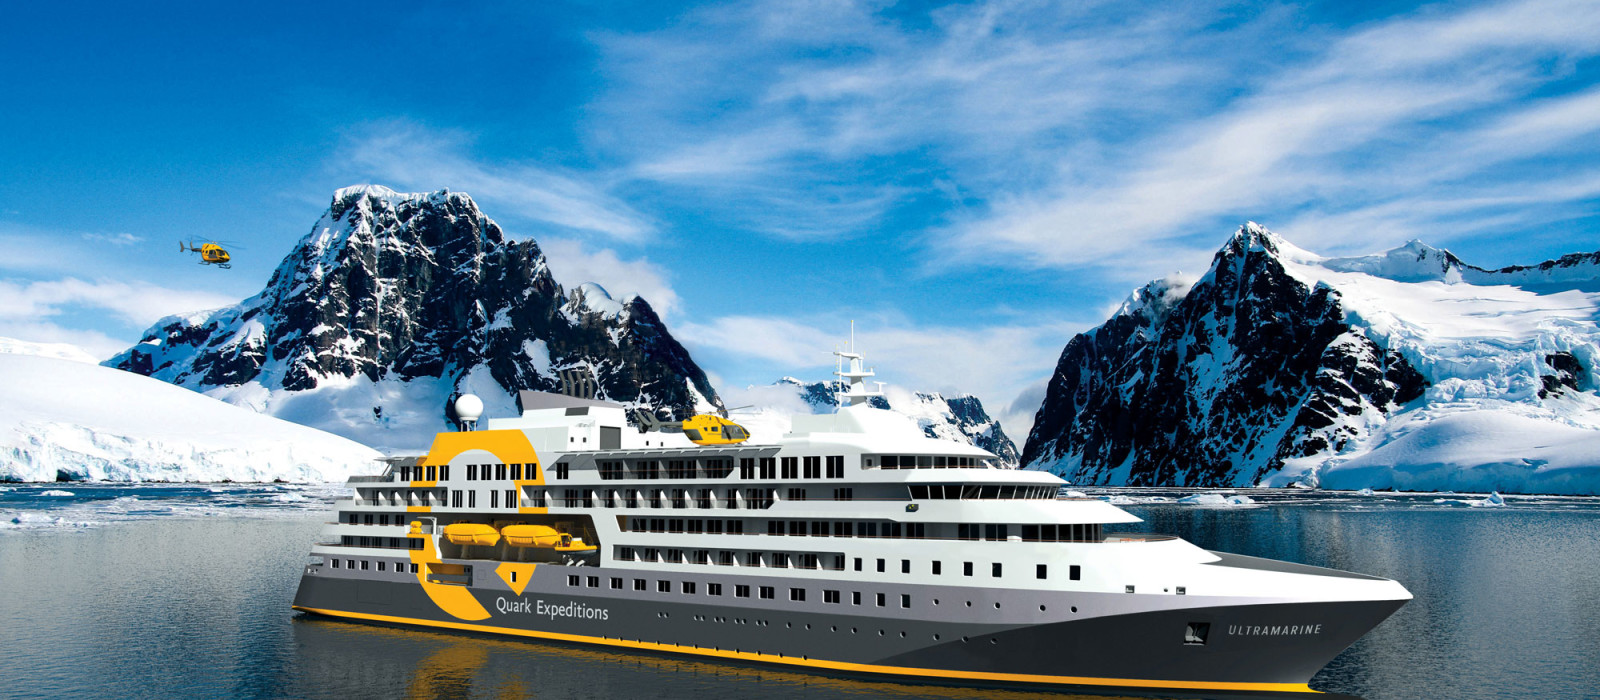 Hotel Ultramarine (Quark Expeditions) Antarktis